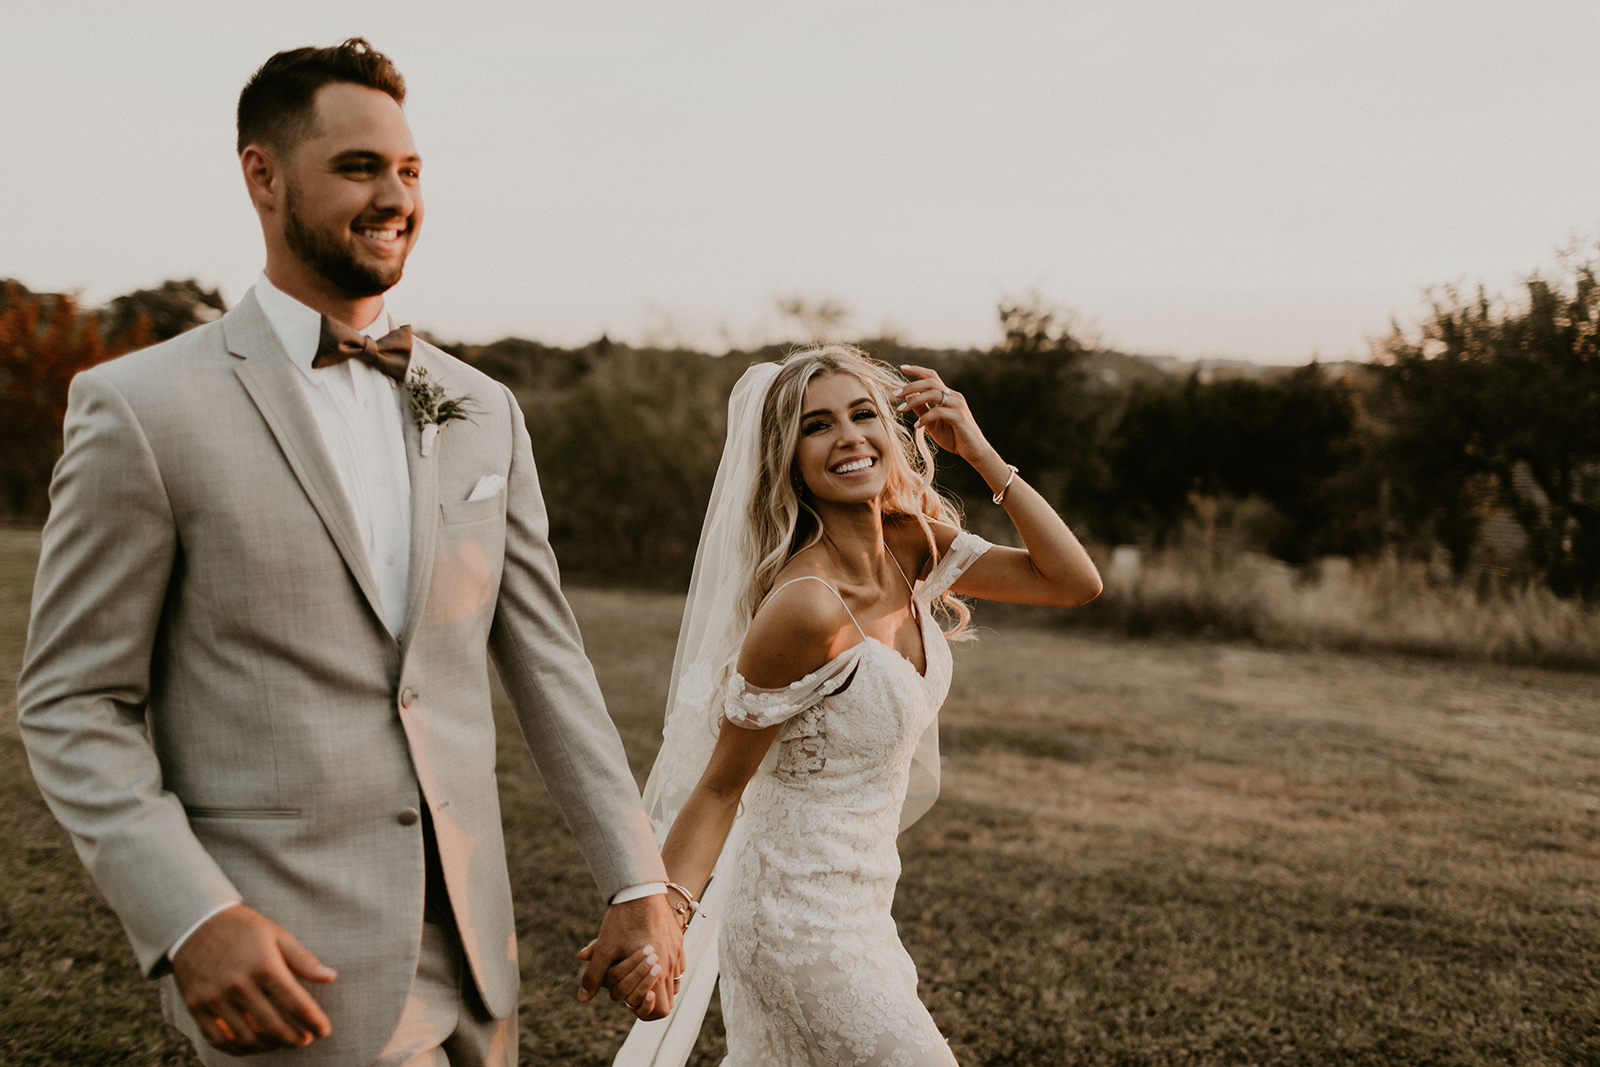 allie-tyler-vintage-villas-austin-texas-wedding-photographer-3353.jpg